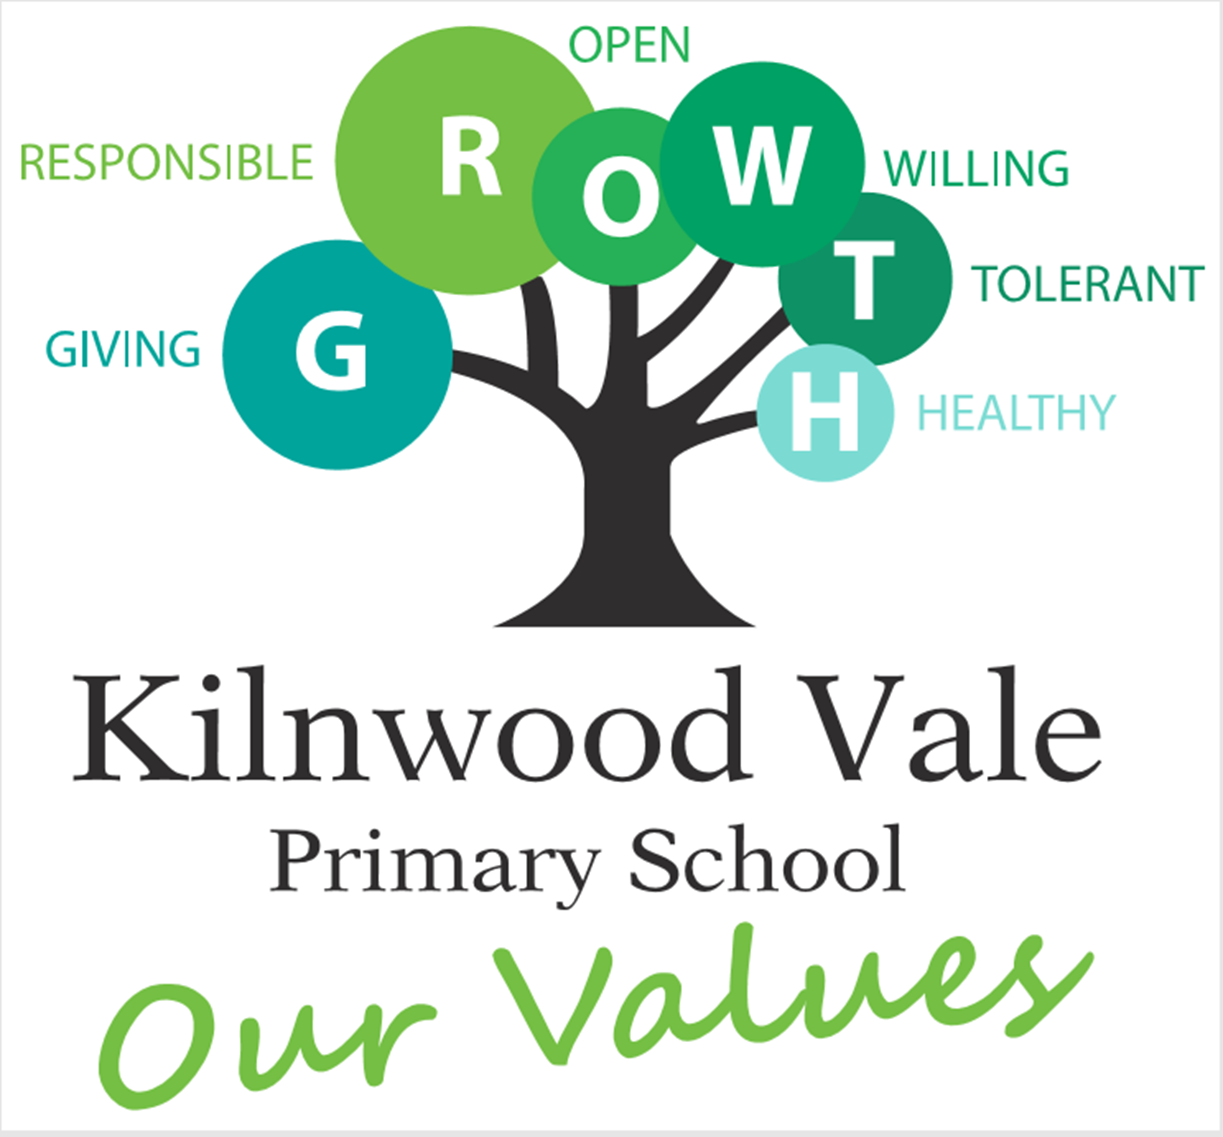 KVP Values image